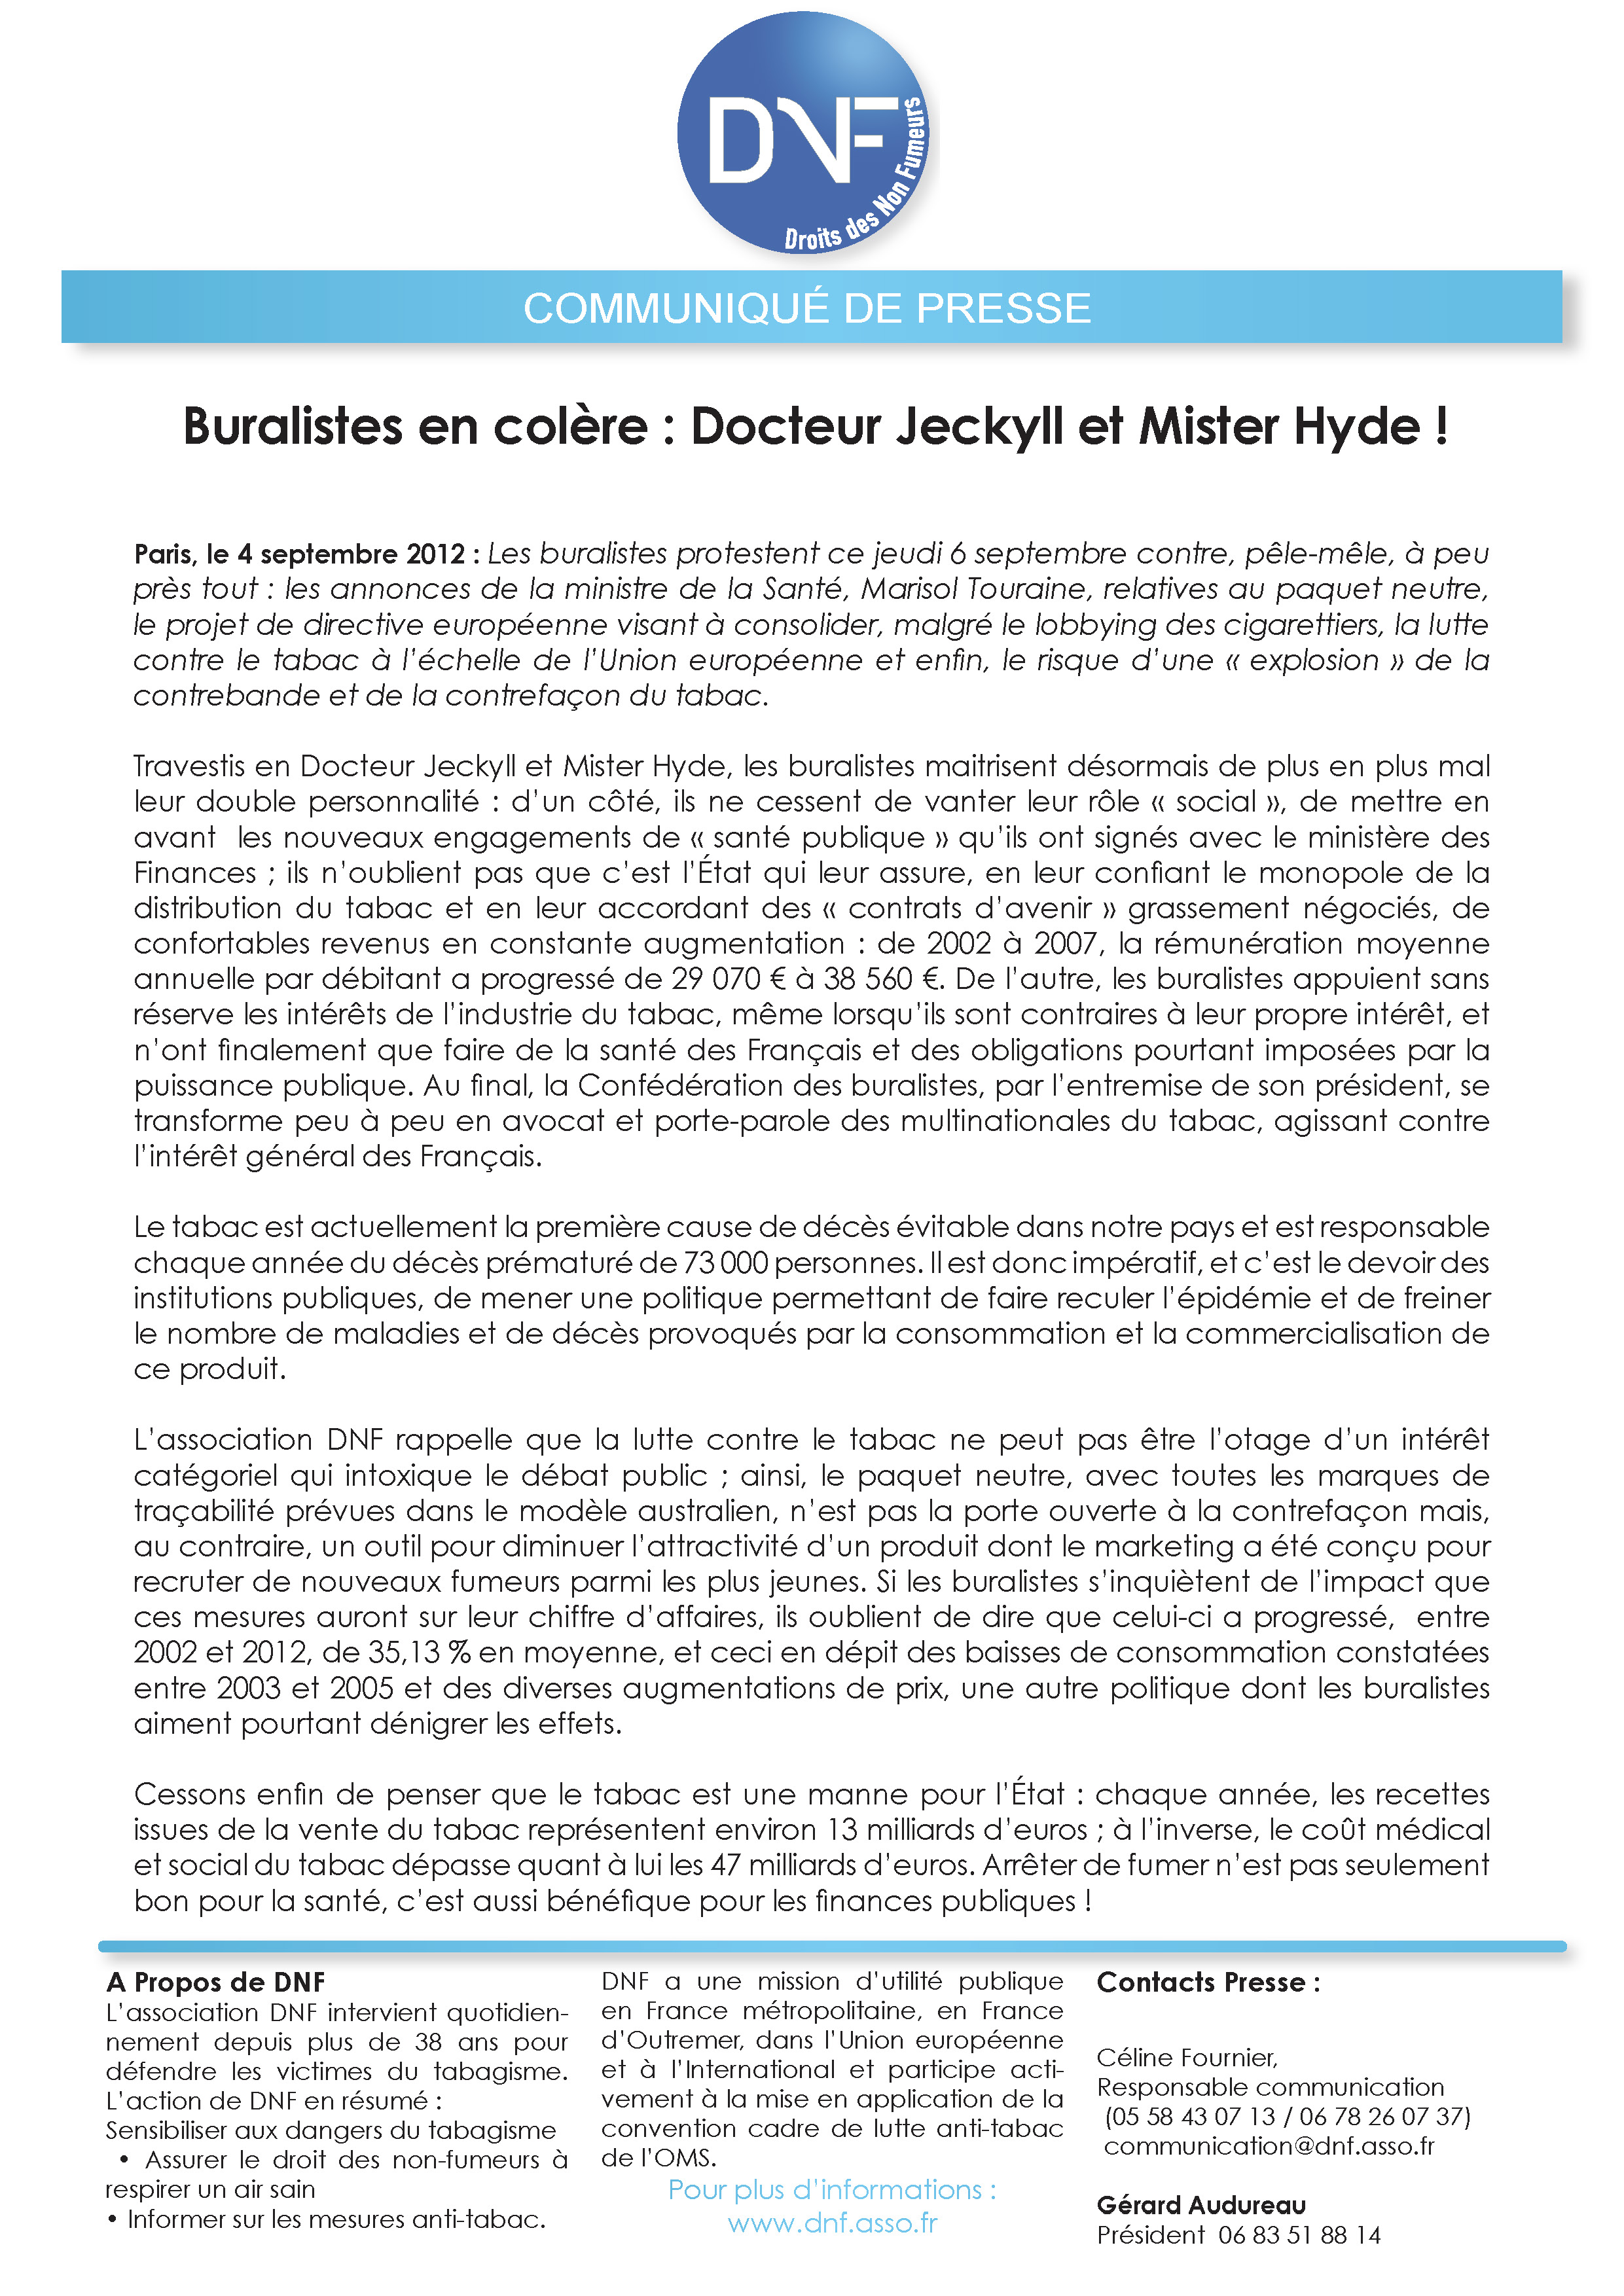 DNF-CP_buralistes-en-colere-4sept2012.jpg